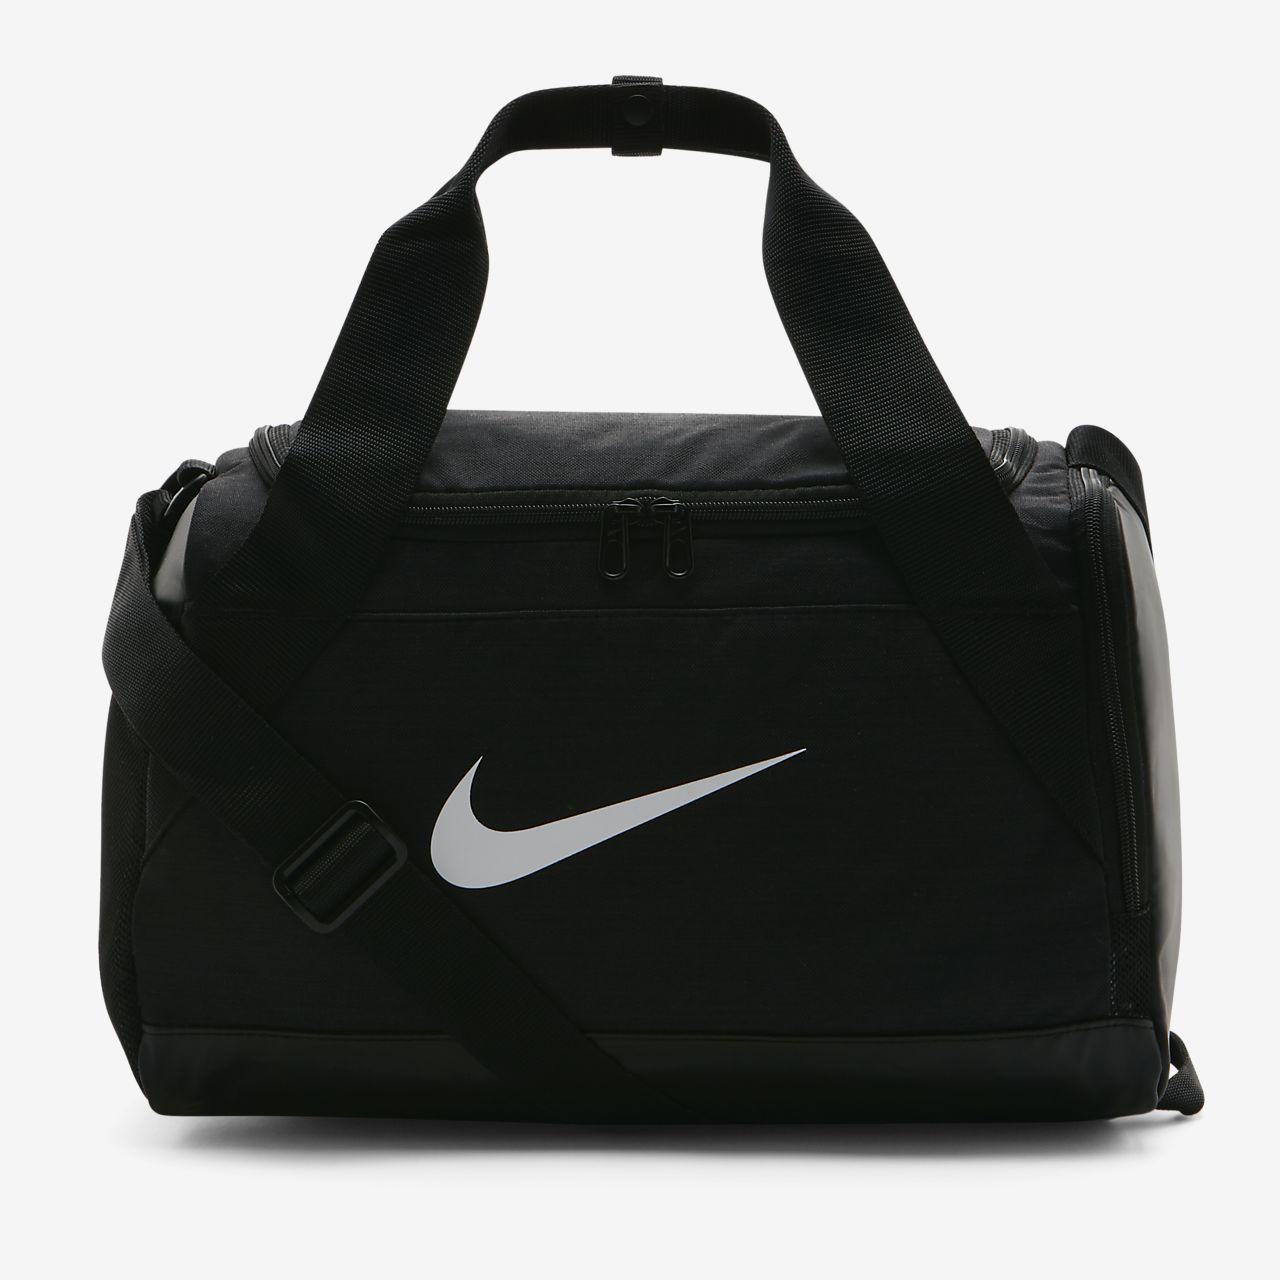 9354df62b06 Mens Small Nike Gym Bag   ReGreen Springfield